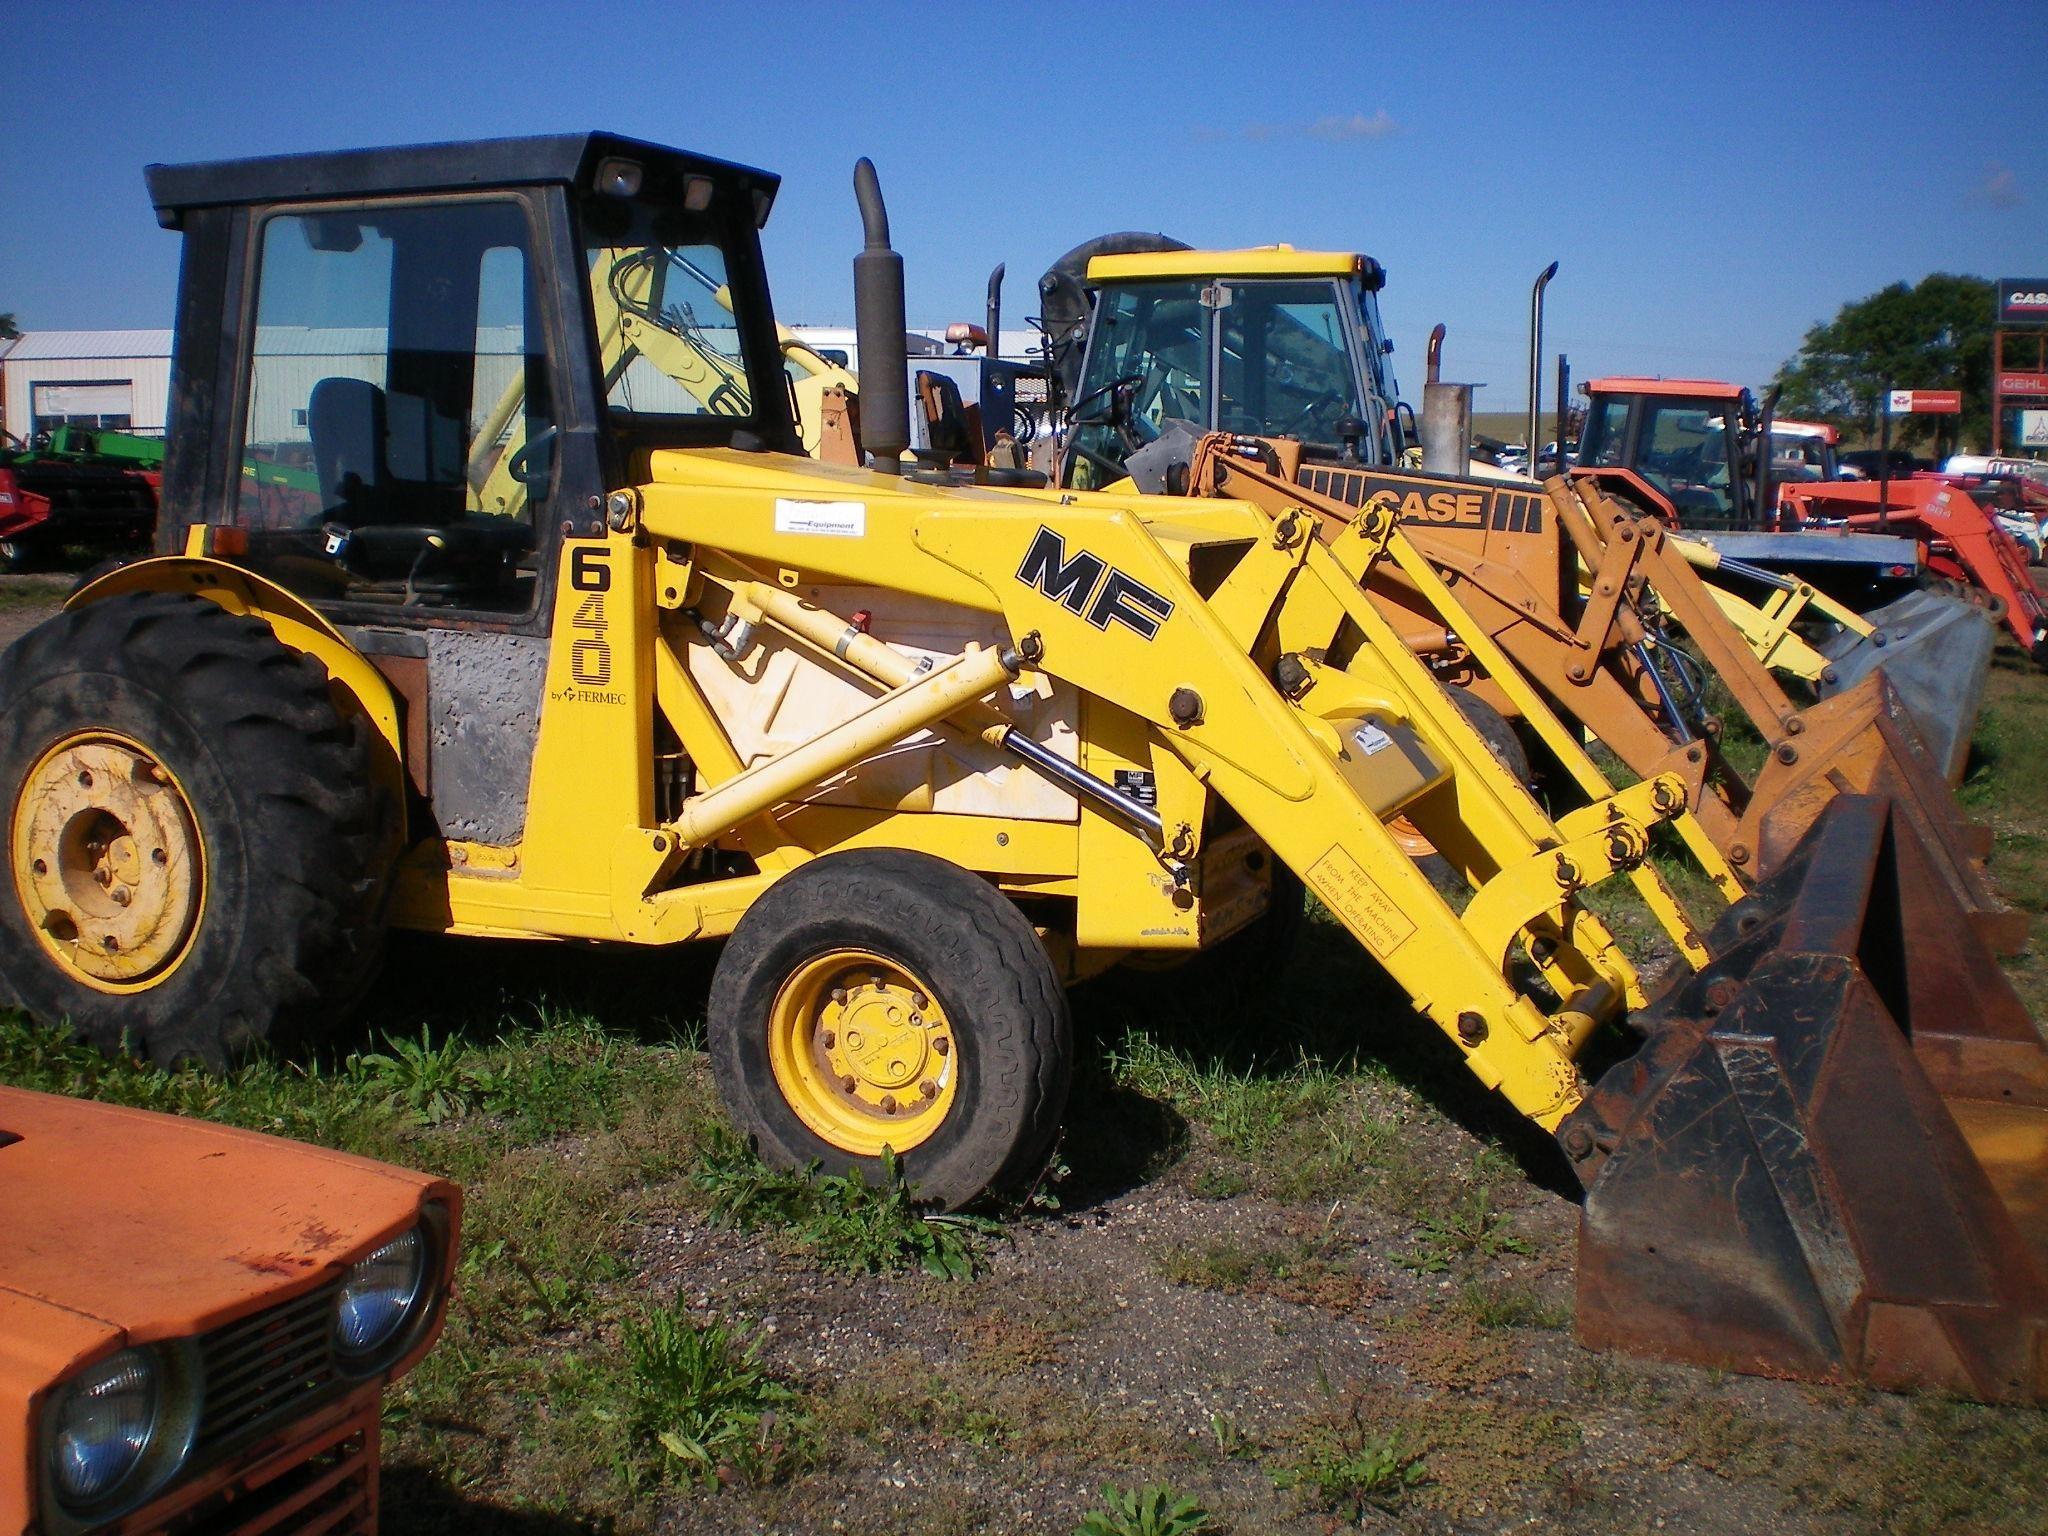 1996 Massey Ferguson 640 Tractor